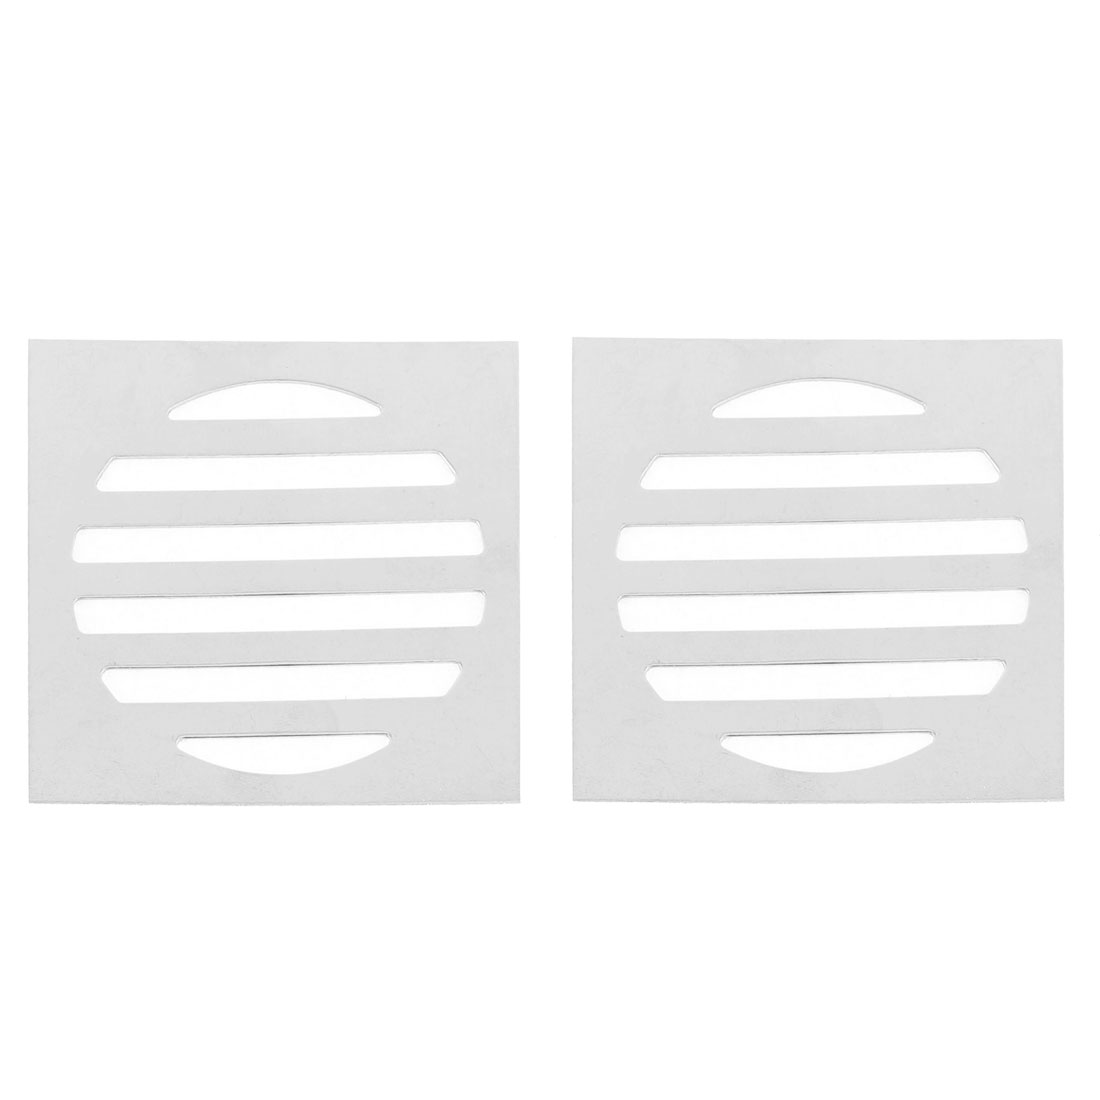 "Stainless Steel Kitchen Bathroom Square Floor Drain Cover 3"" 7.5cm 2pcs"